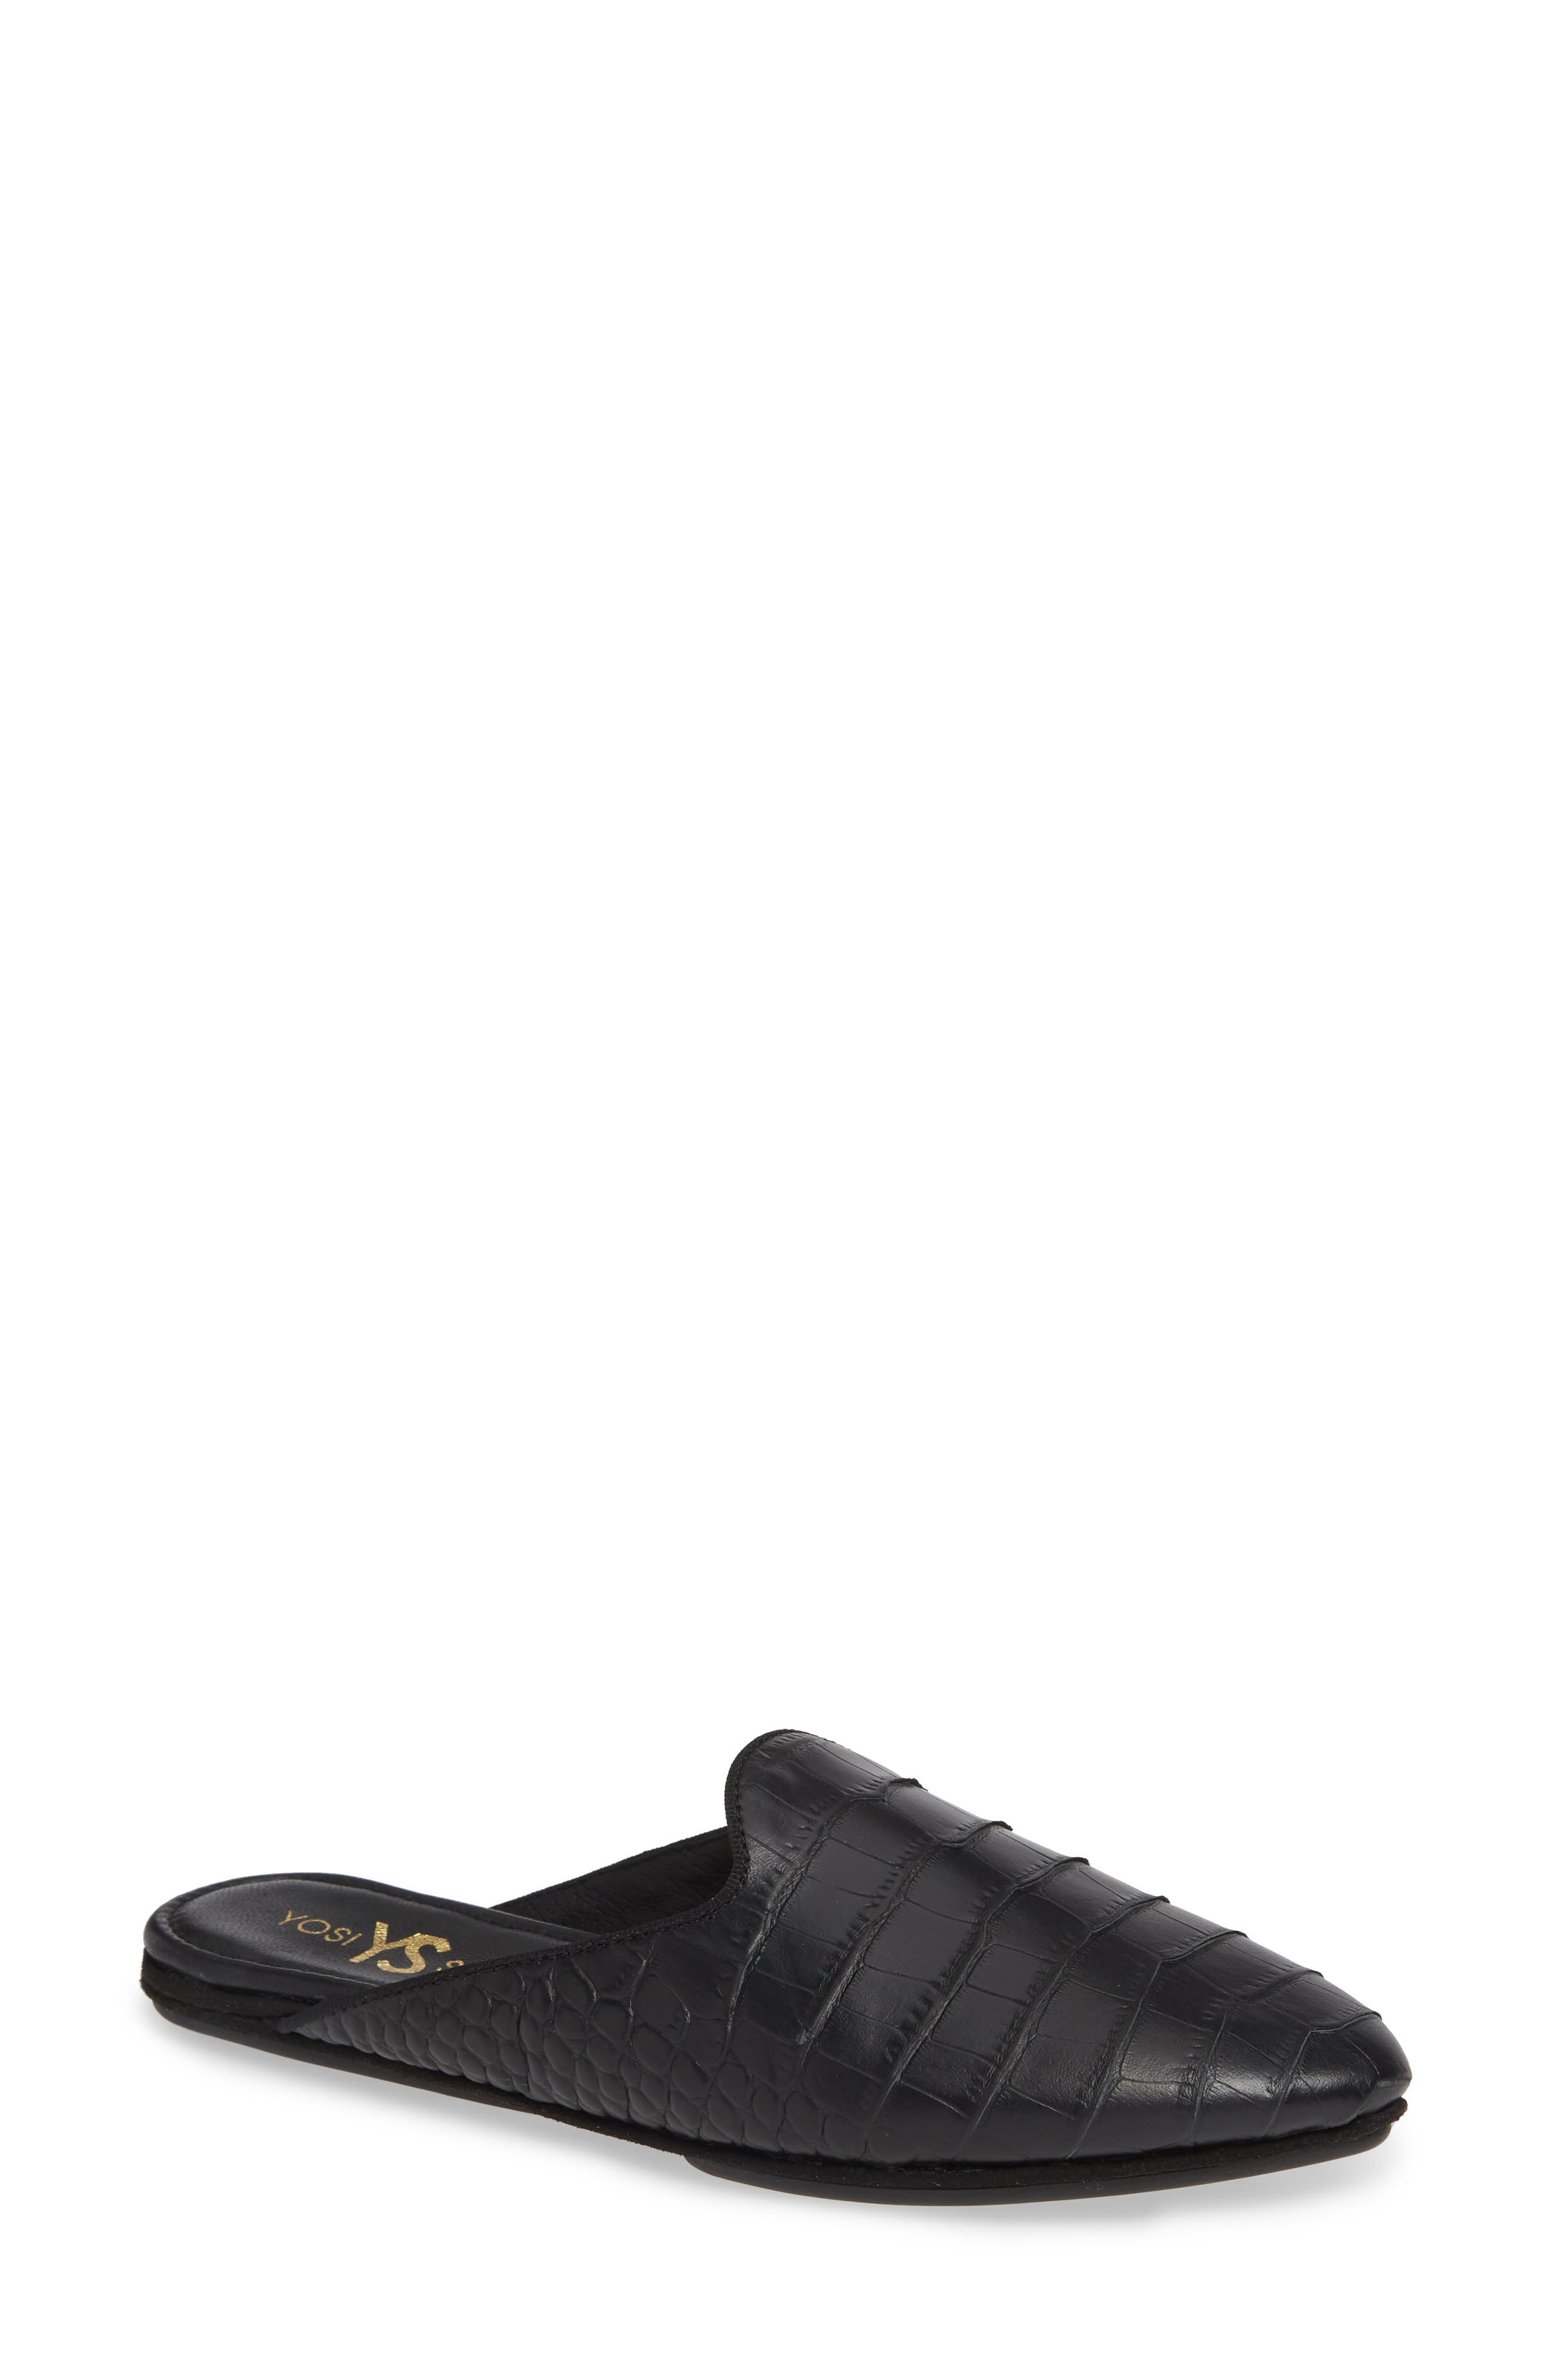 YOSI SAMRA Vidi Mule in Black Crocodile Leather